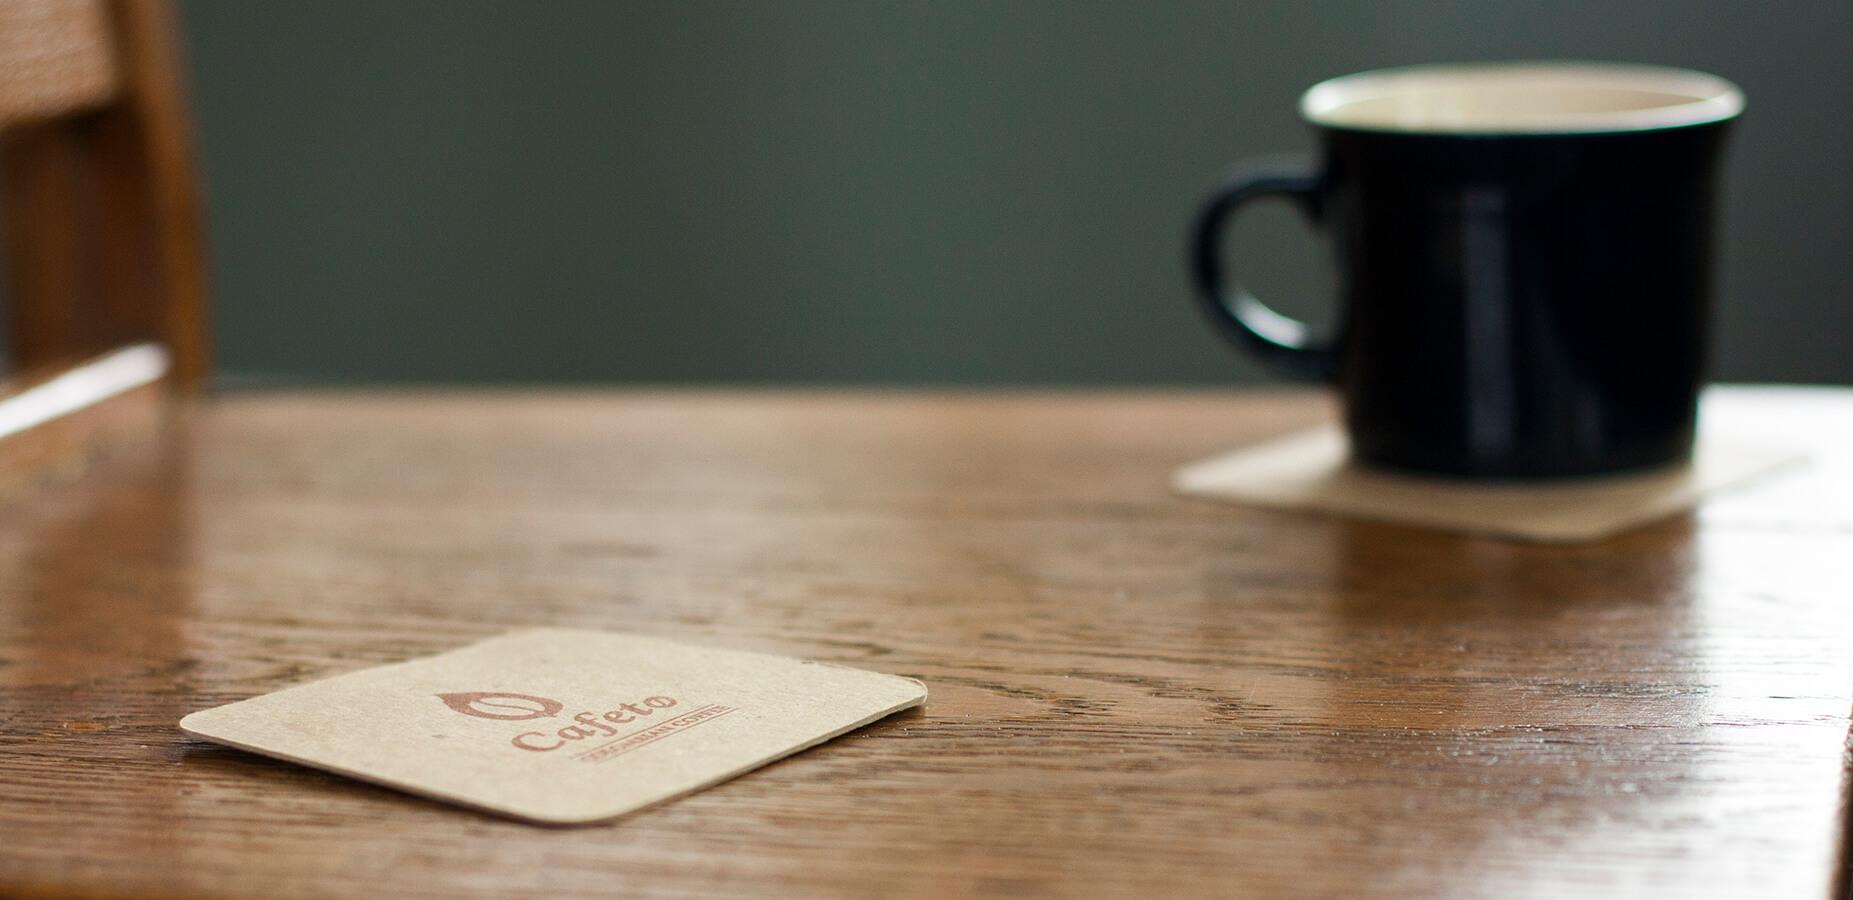 Cafeto, Coaster